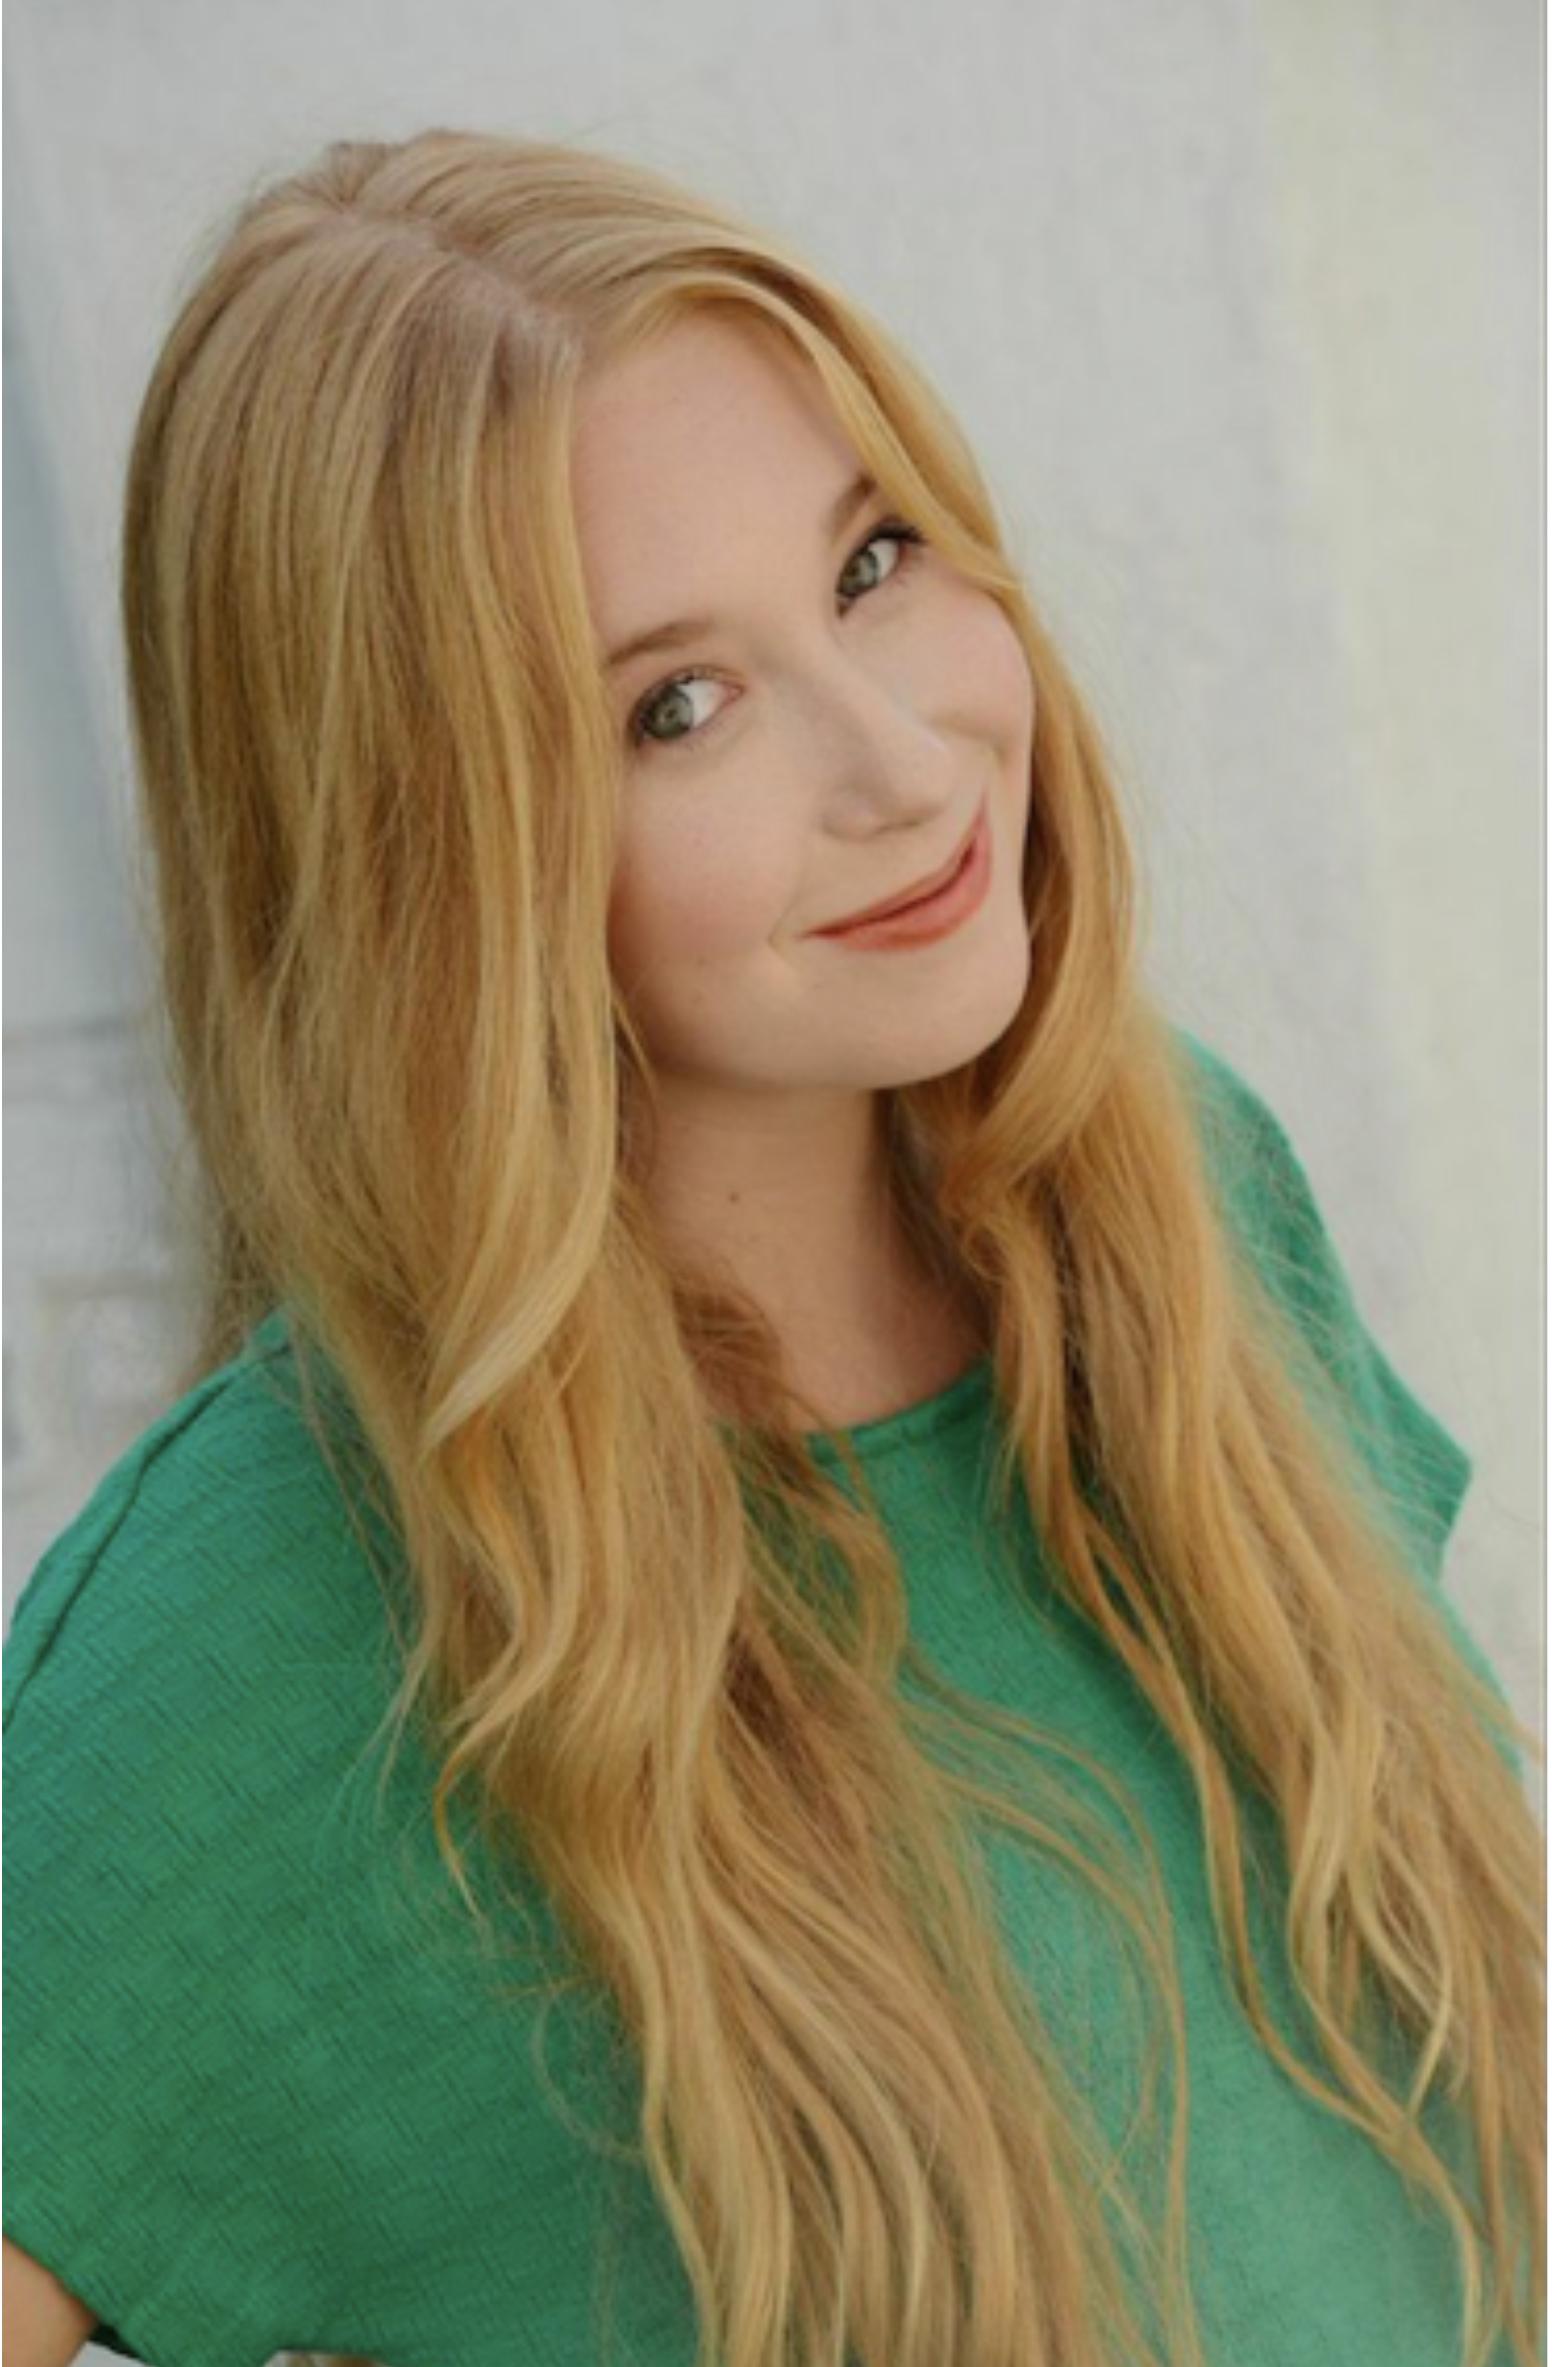 Lizzy Rich